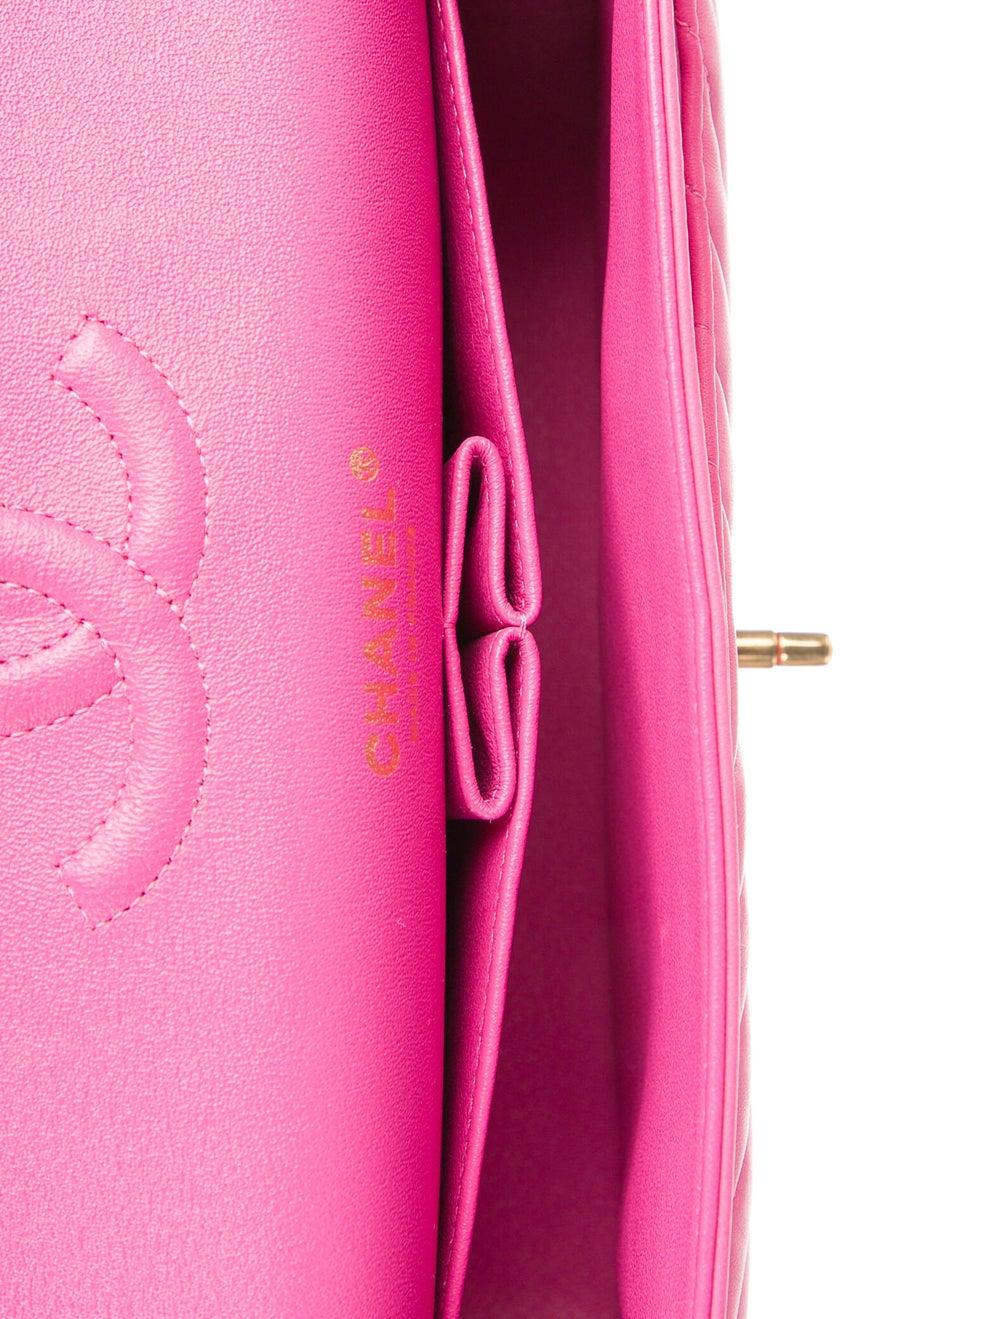 Chanel Chevron Medium Double Flap Bag Pink - image 5